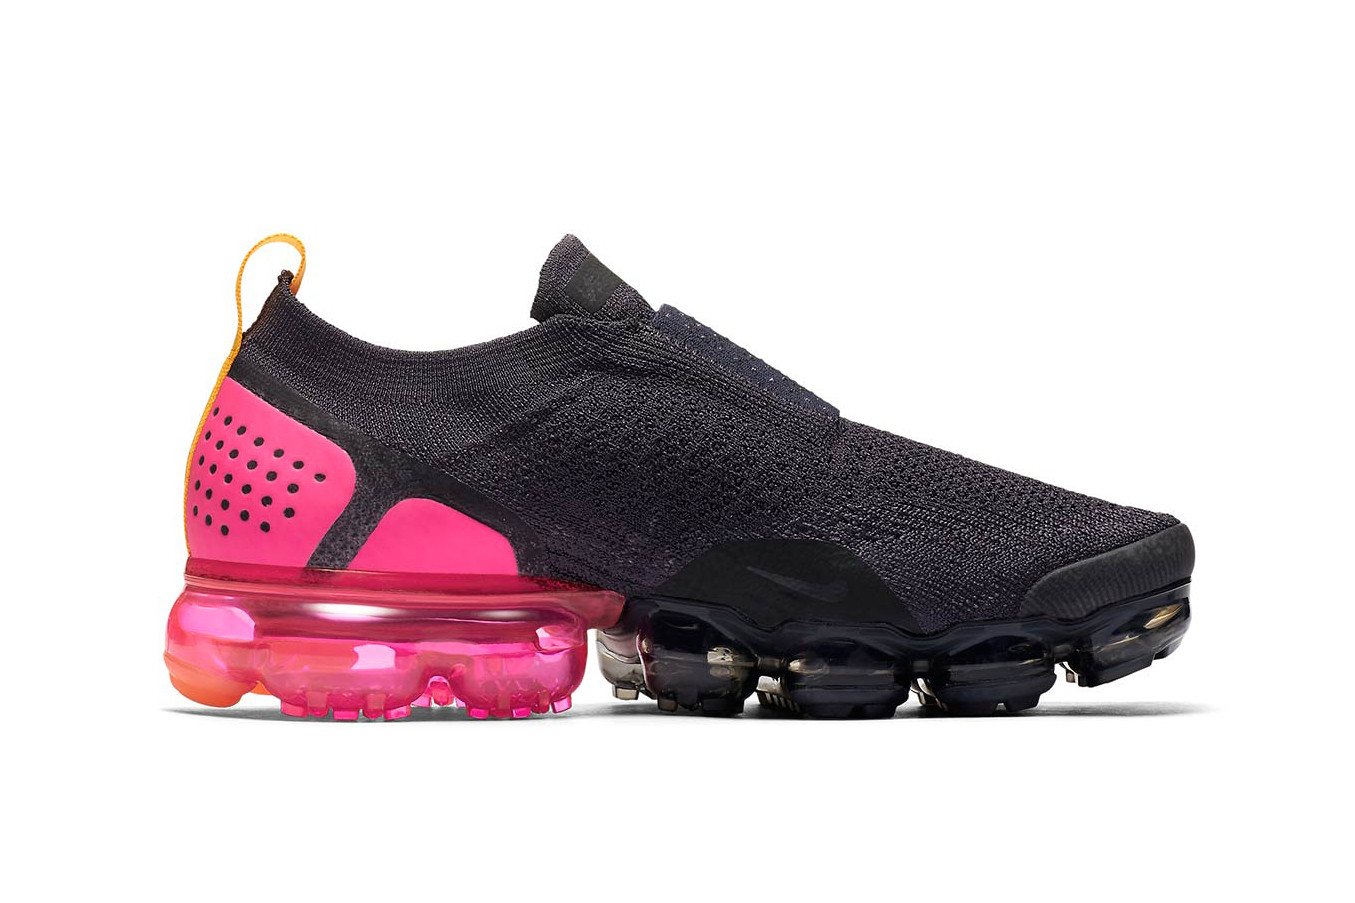 c5d309891eb Nike Air VaporMax Moc 2 Pink Blast